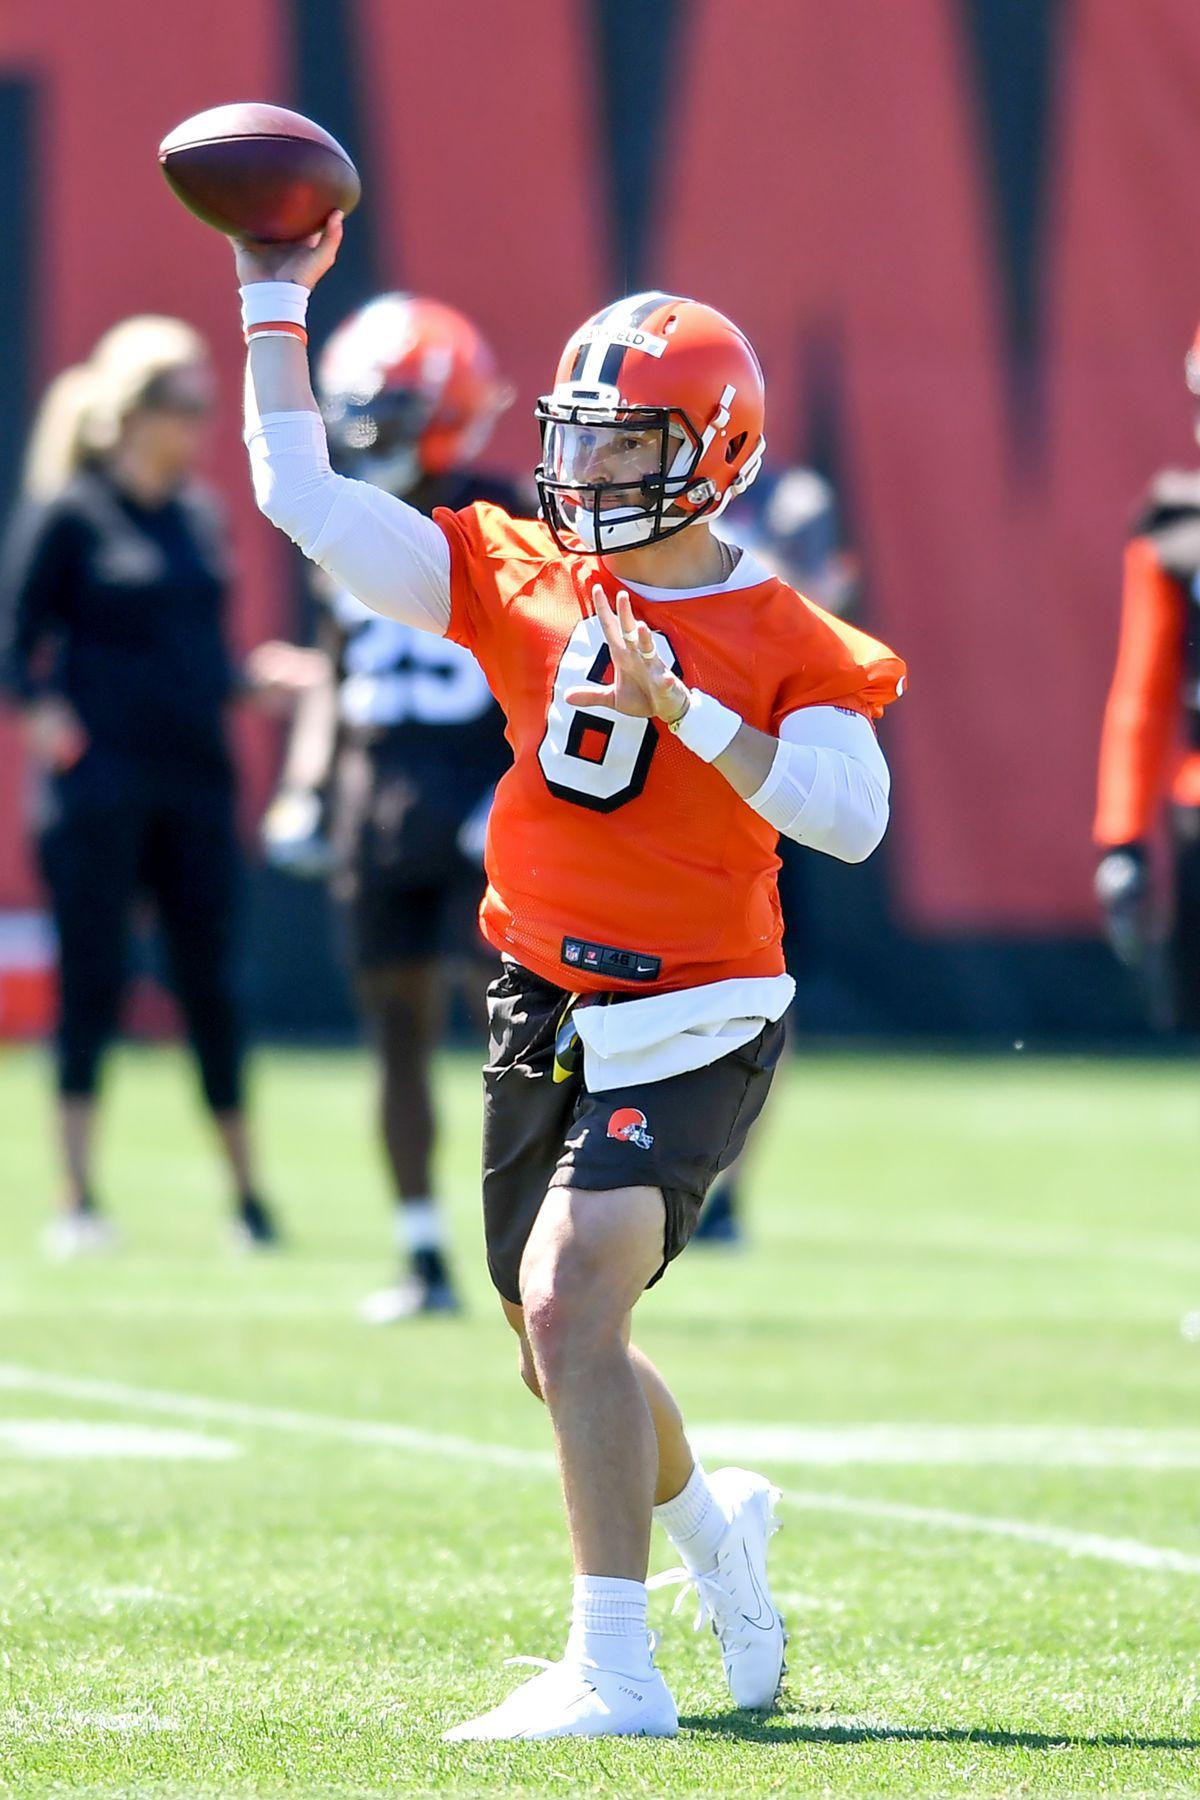 Cleveland Browns Mandatory Minicamp